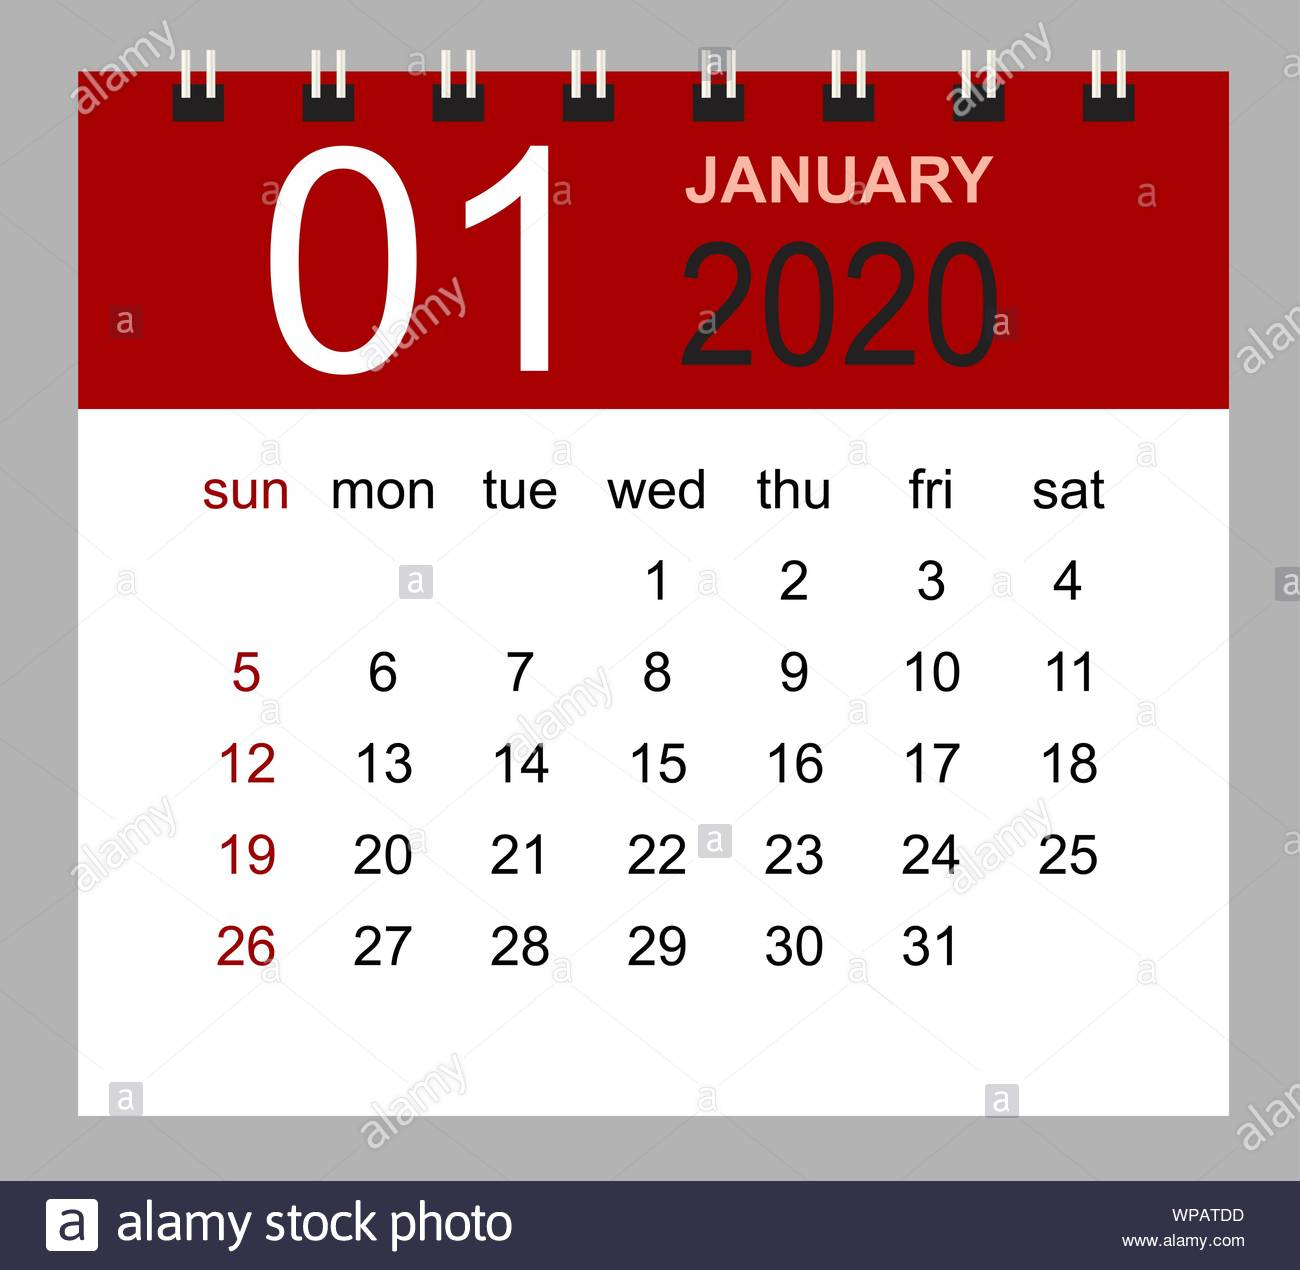 Simple Desk Calendar For January 2020. Week Starts Sunday